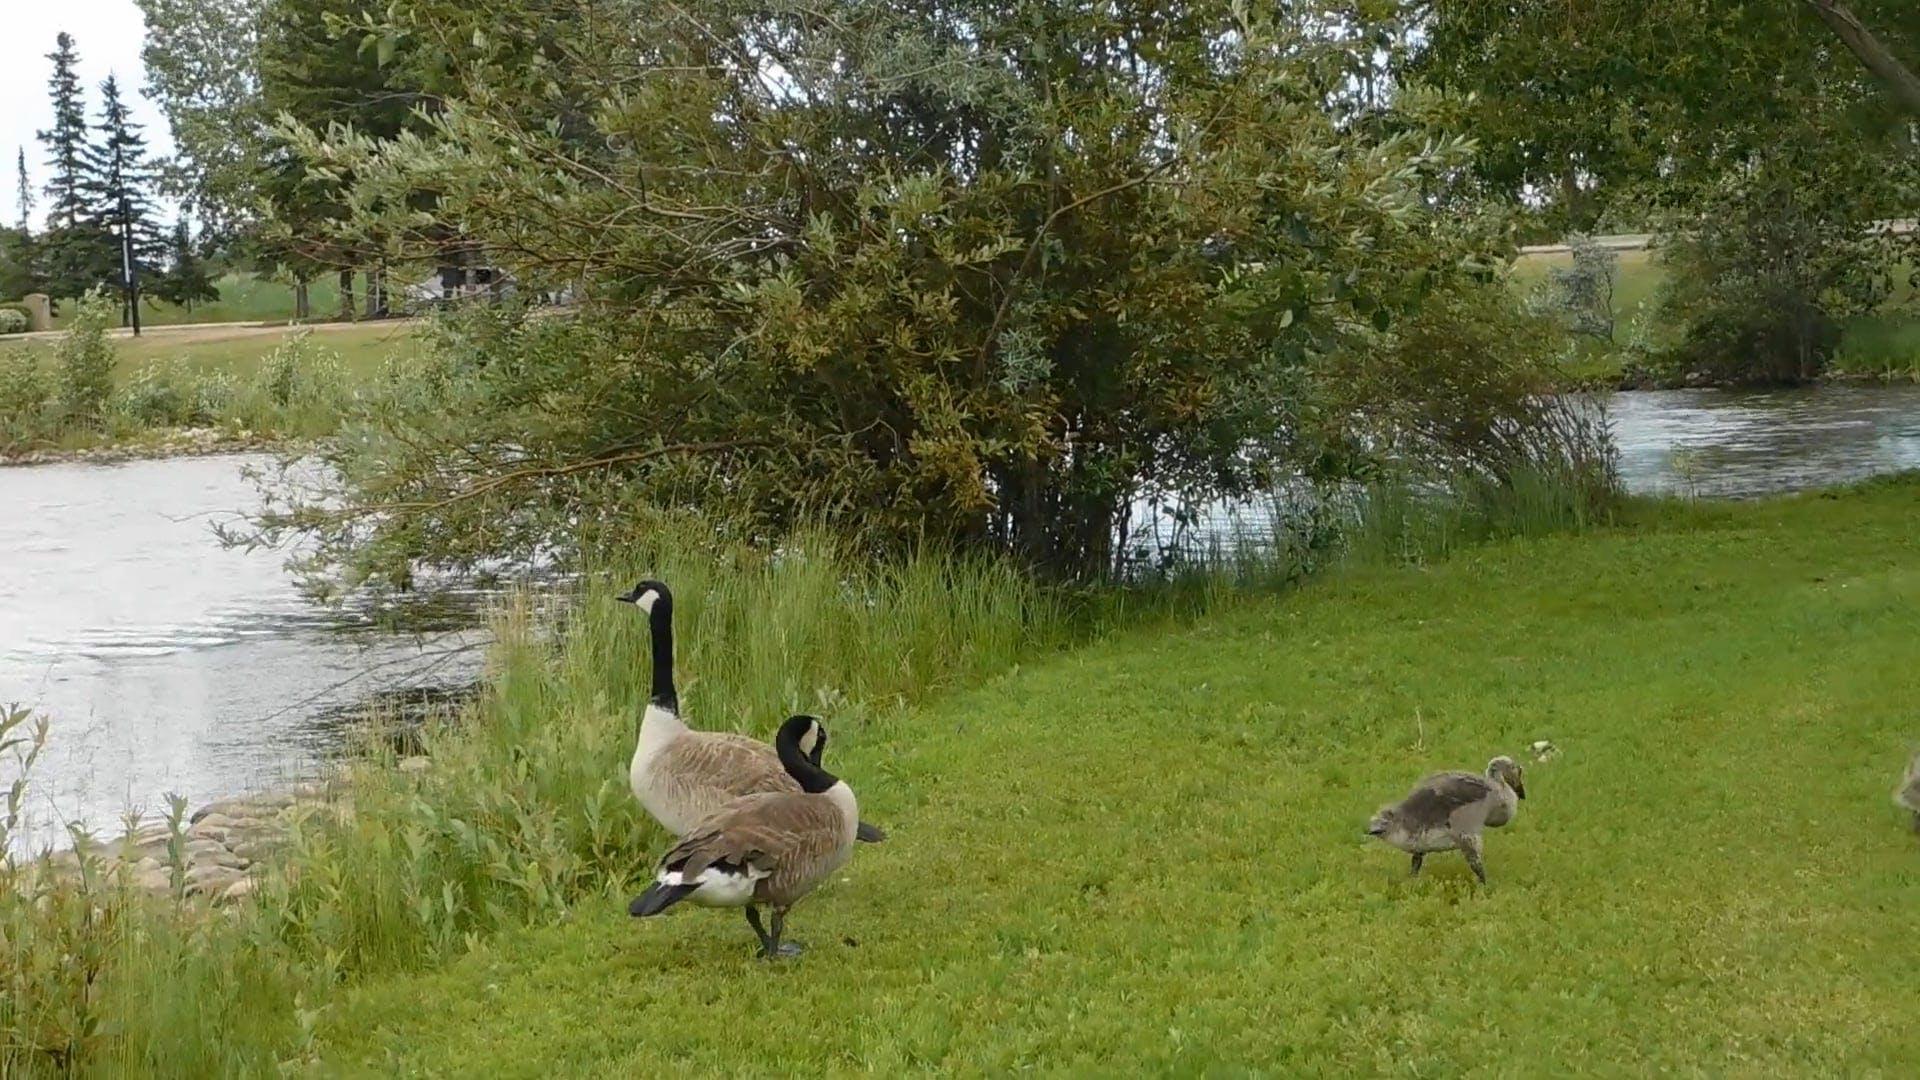 Video of Ducks On Grass